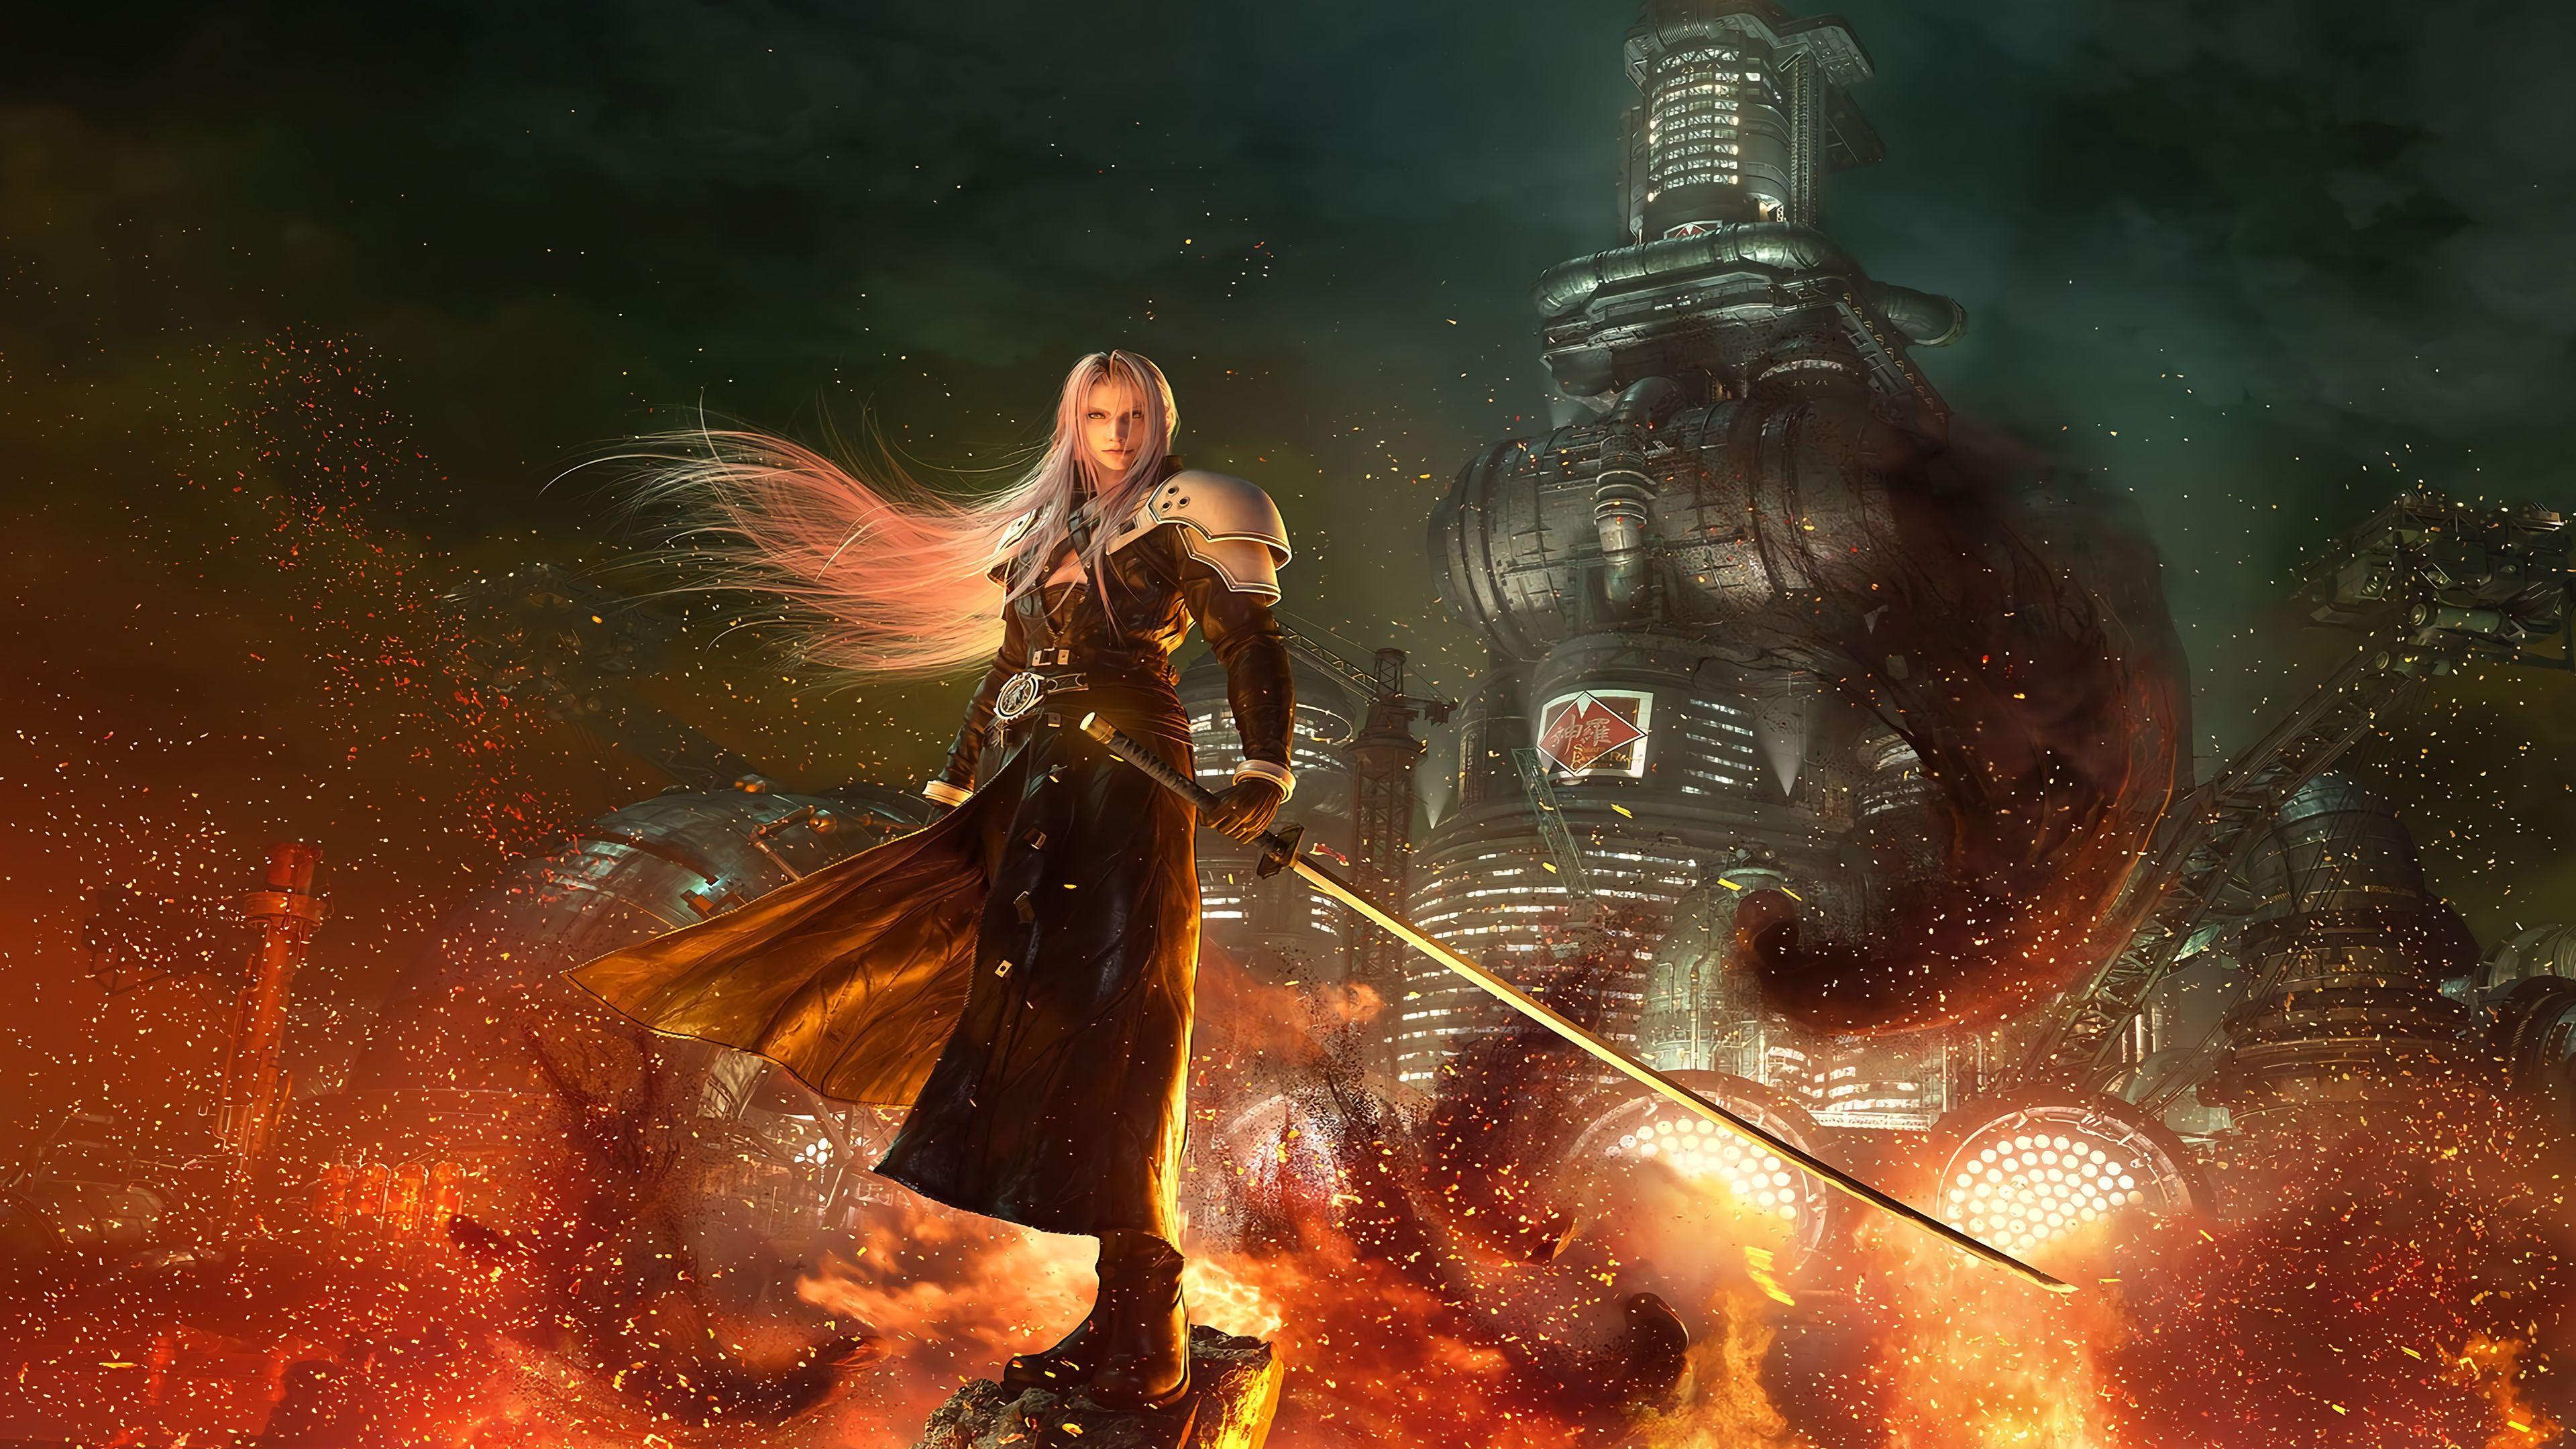 Final Fantasy 4k Wallpapers Top Free Final Fantasy 4k